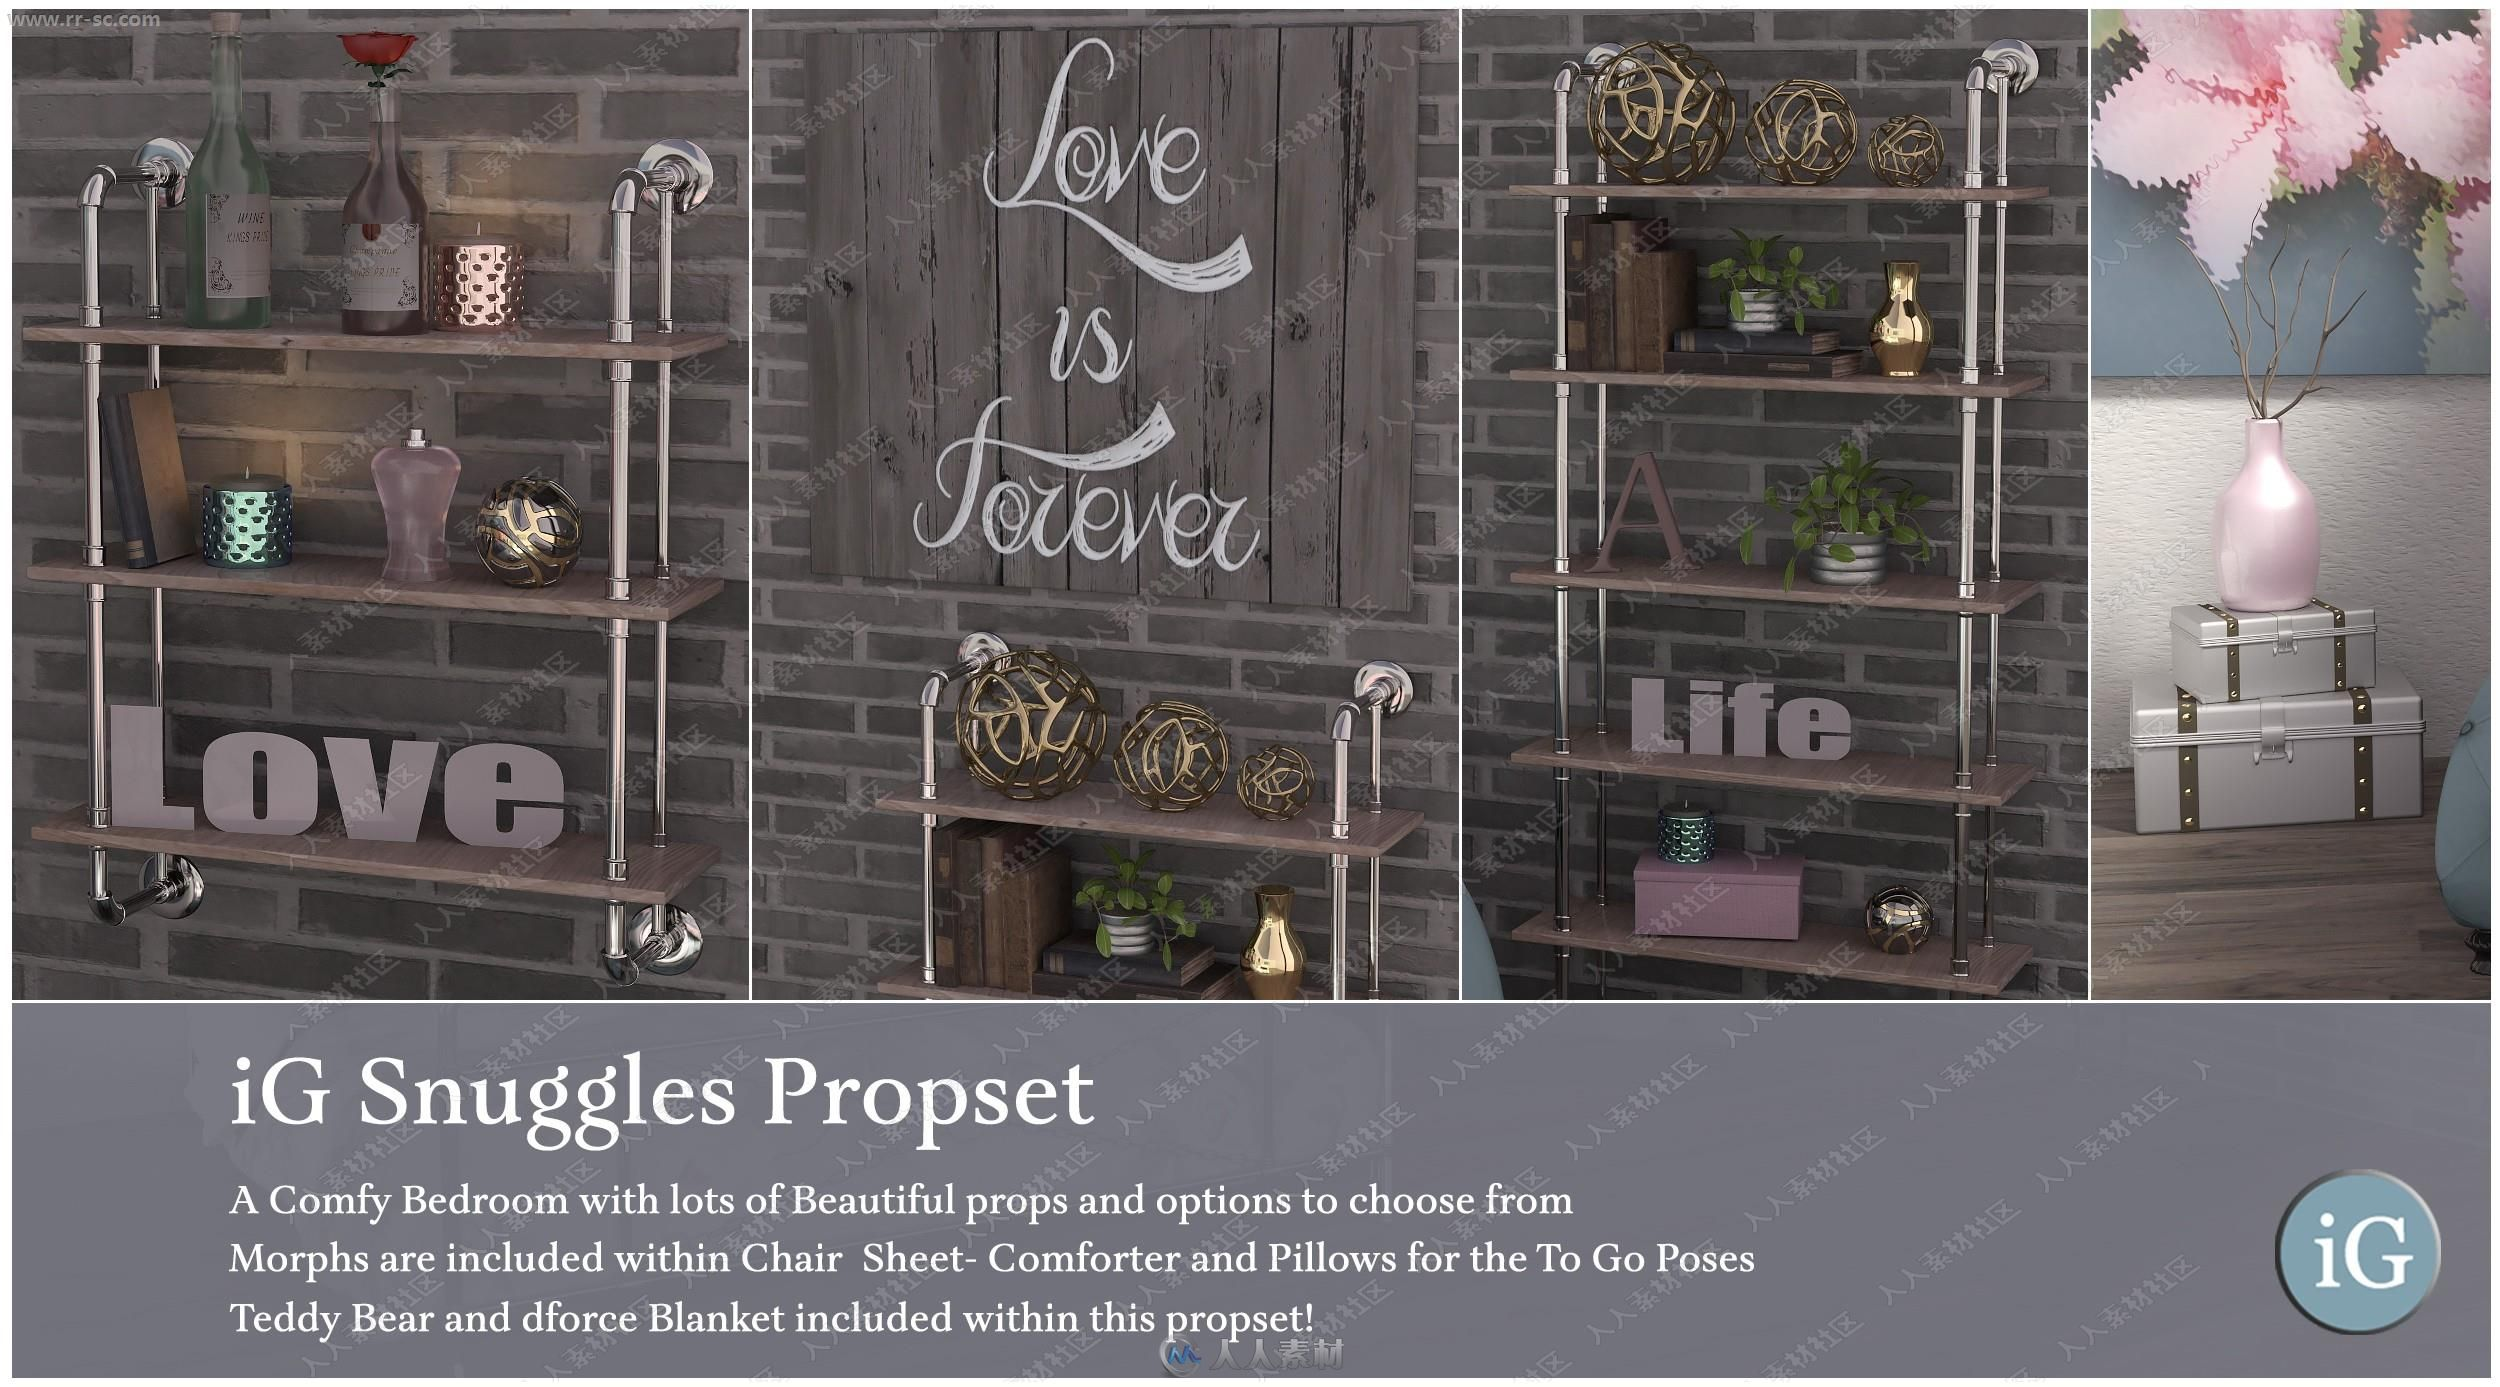 iG Snuggles Bundle温馨房间环境设施双人亲昵依偎姿势3D模型